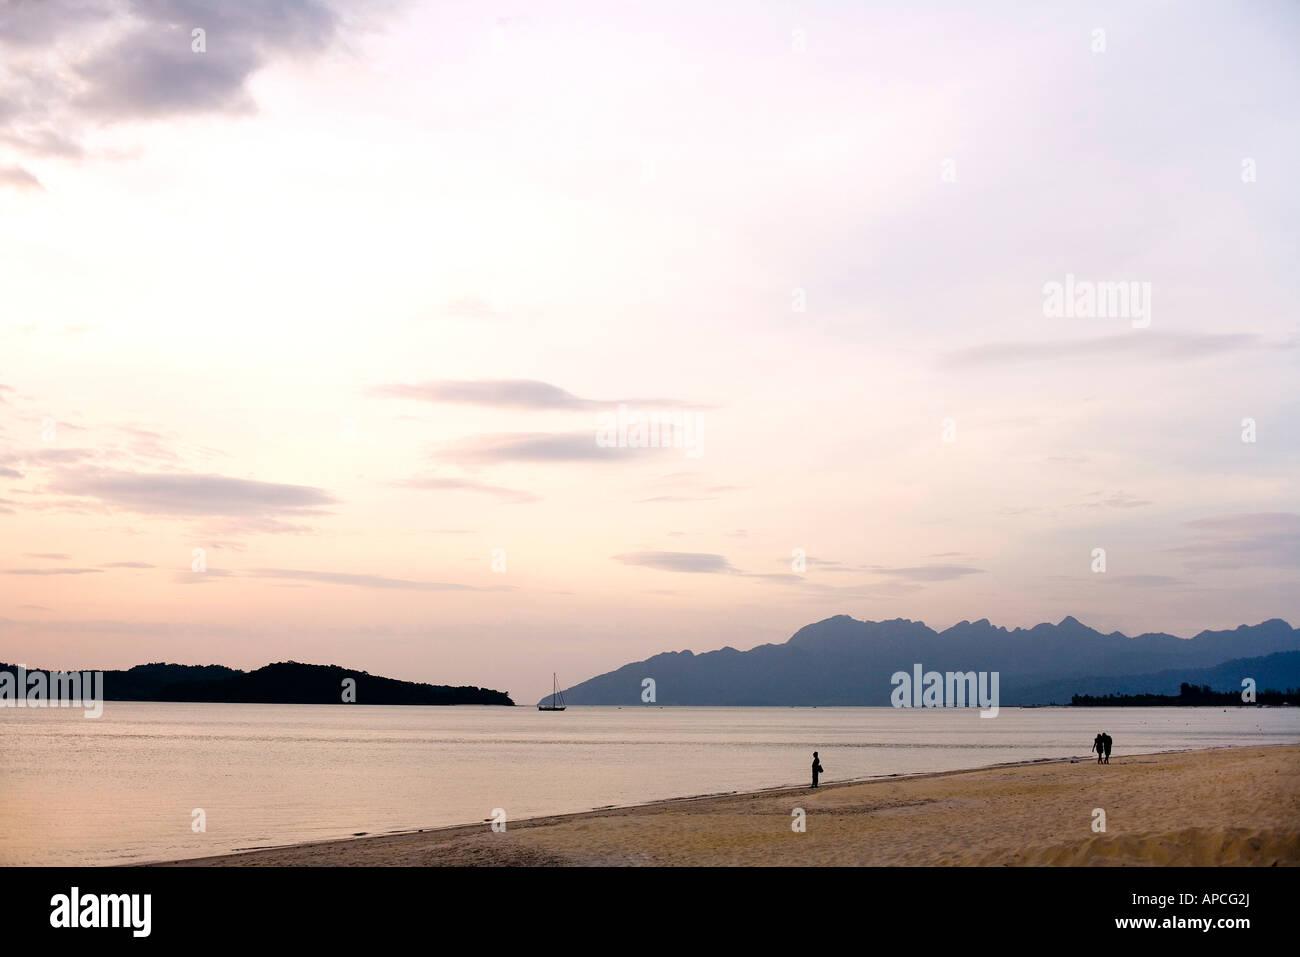 Pantai Tengah beach,  Langkawi Island, Malaysia - Stock Image